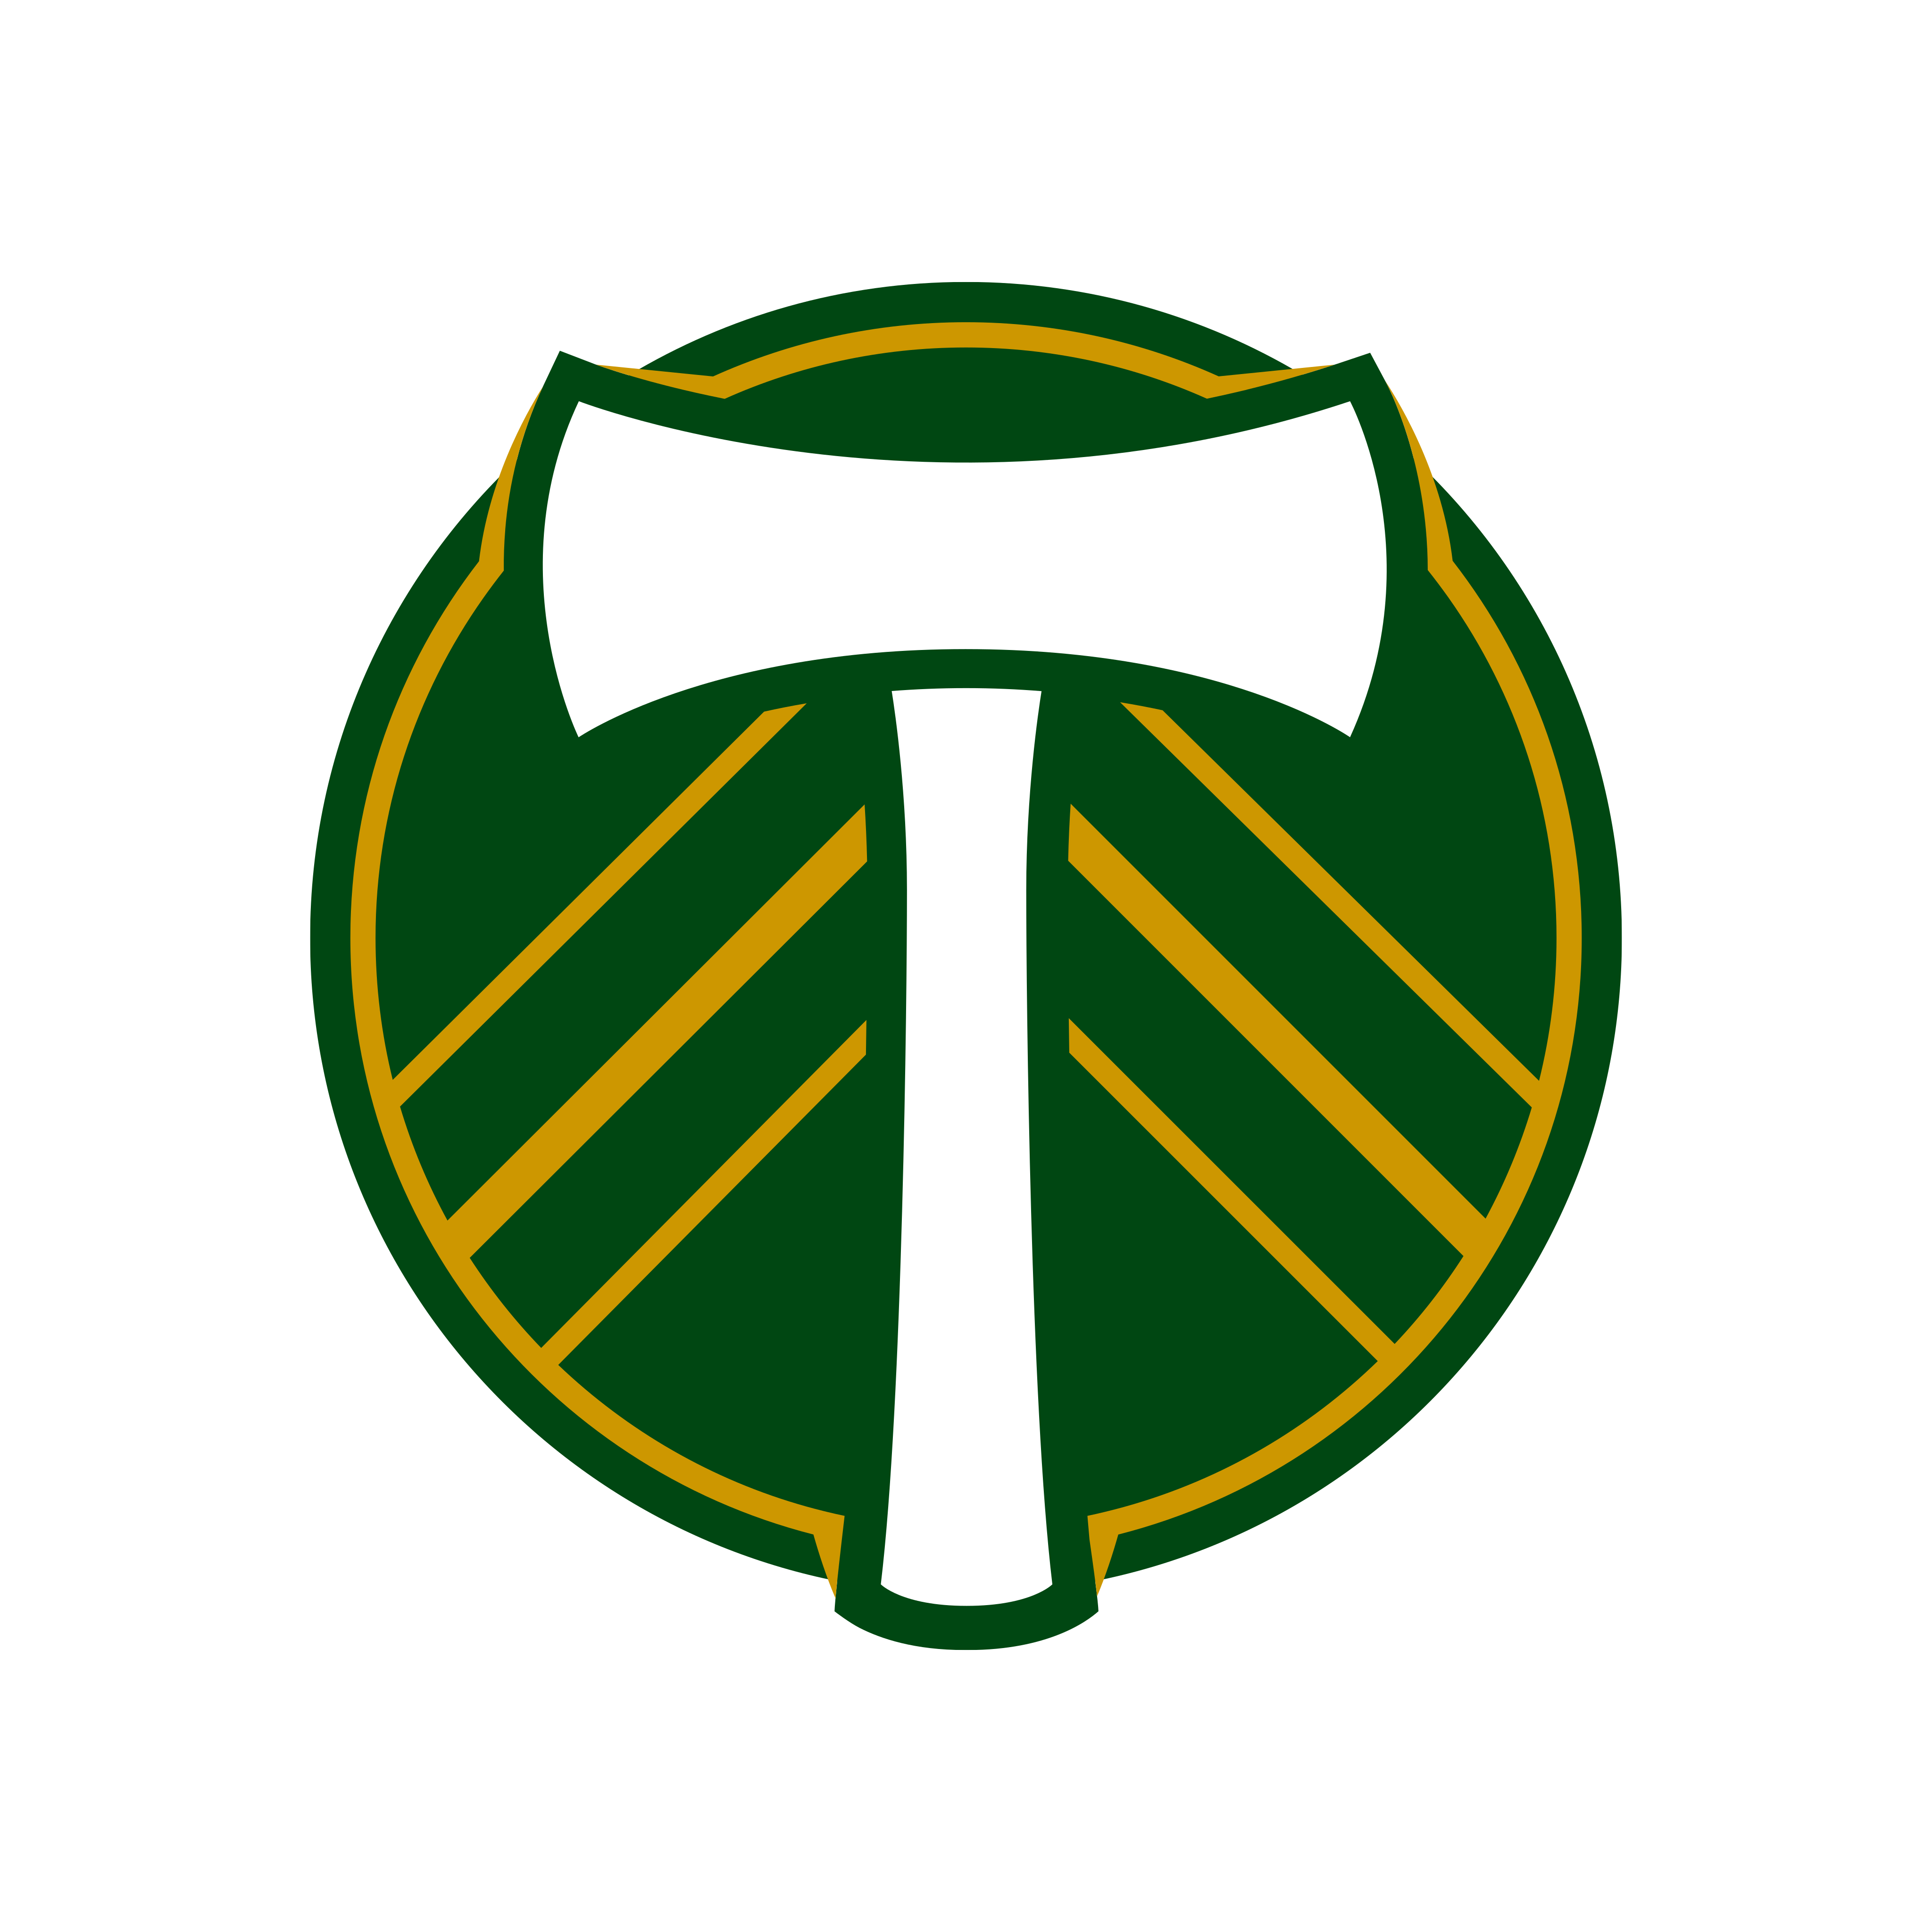 portland timbers logo 0 - Portland Timbers Logo